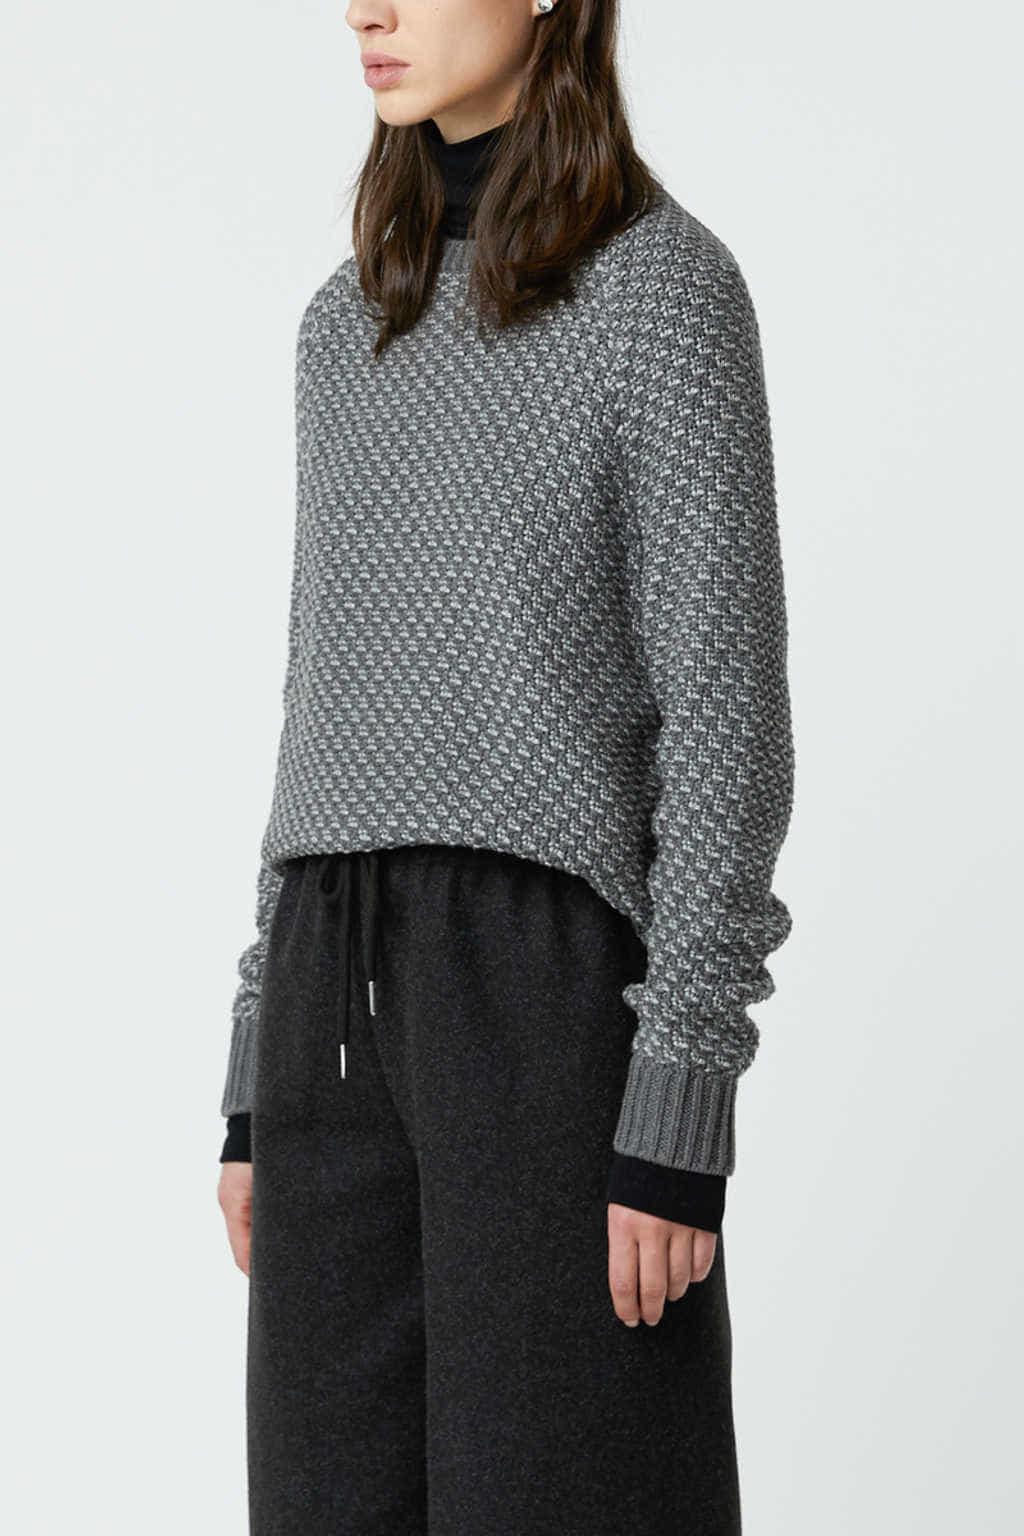 Sweater 3027 Gray 2